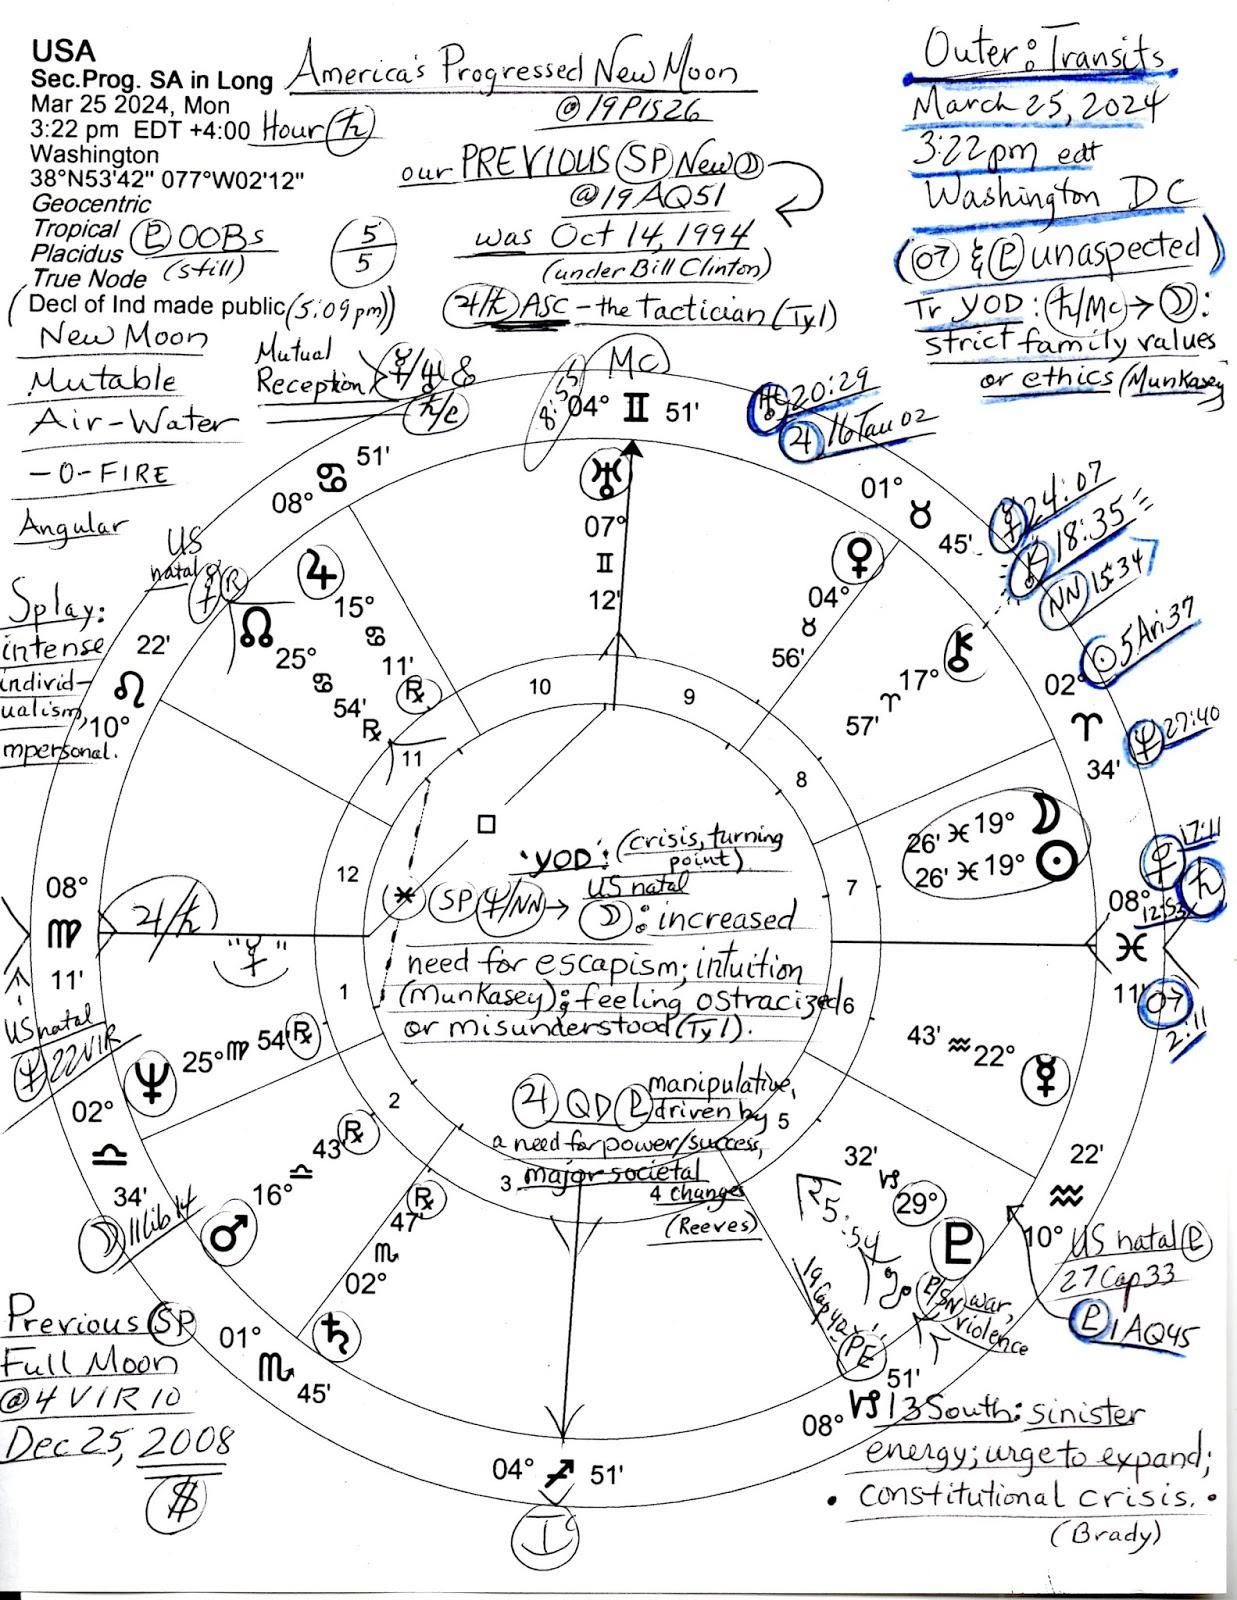 Stars Over Washington | Page 13 | AstroDispatch – Astrology Around